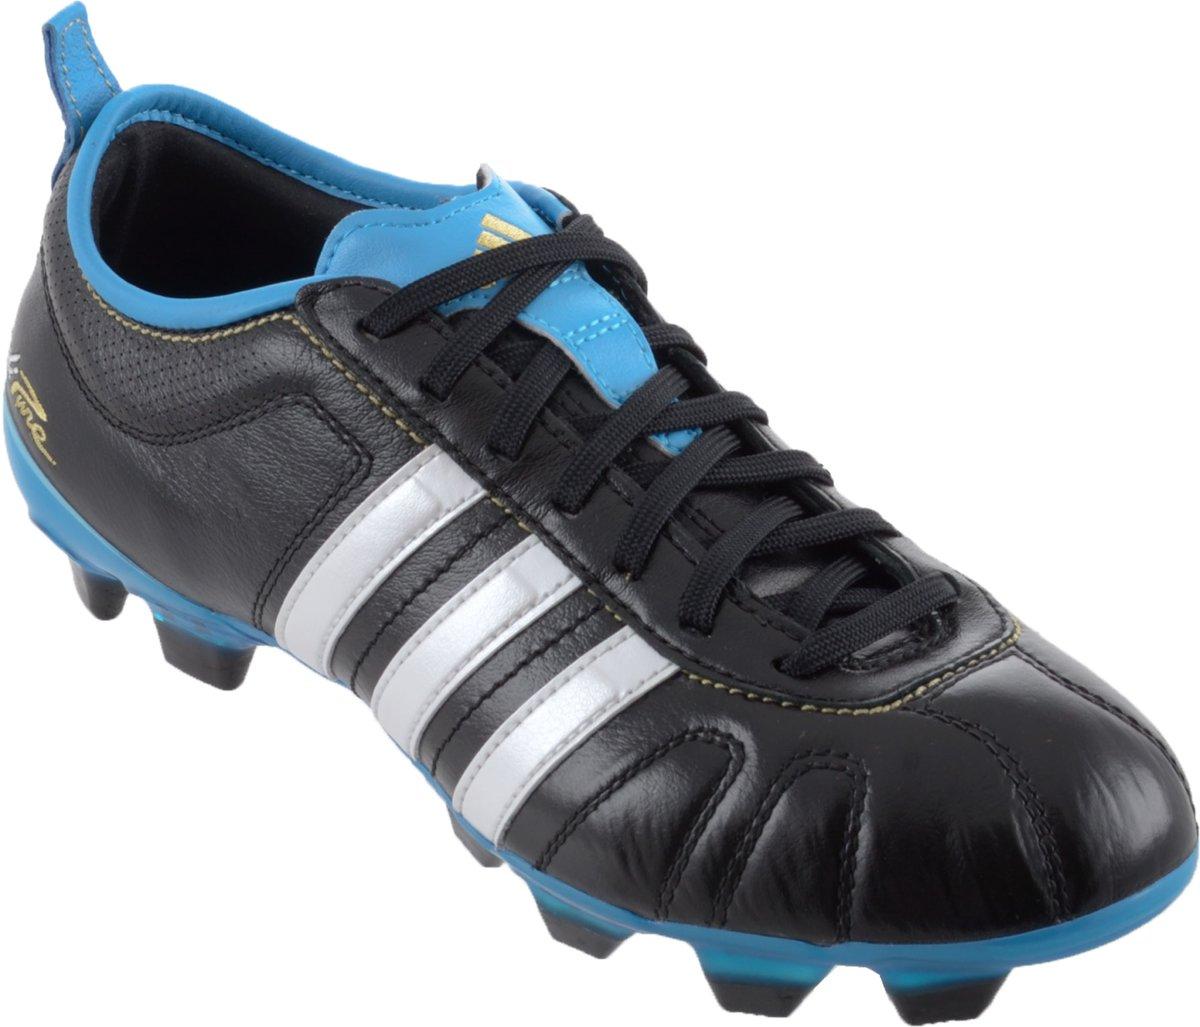 online store 495be 8df22 bol.com   adidas adiPure IV TRX FG - Voetbalschoenen - Unisex - Maat 46 -  Zwart